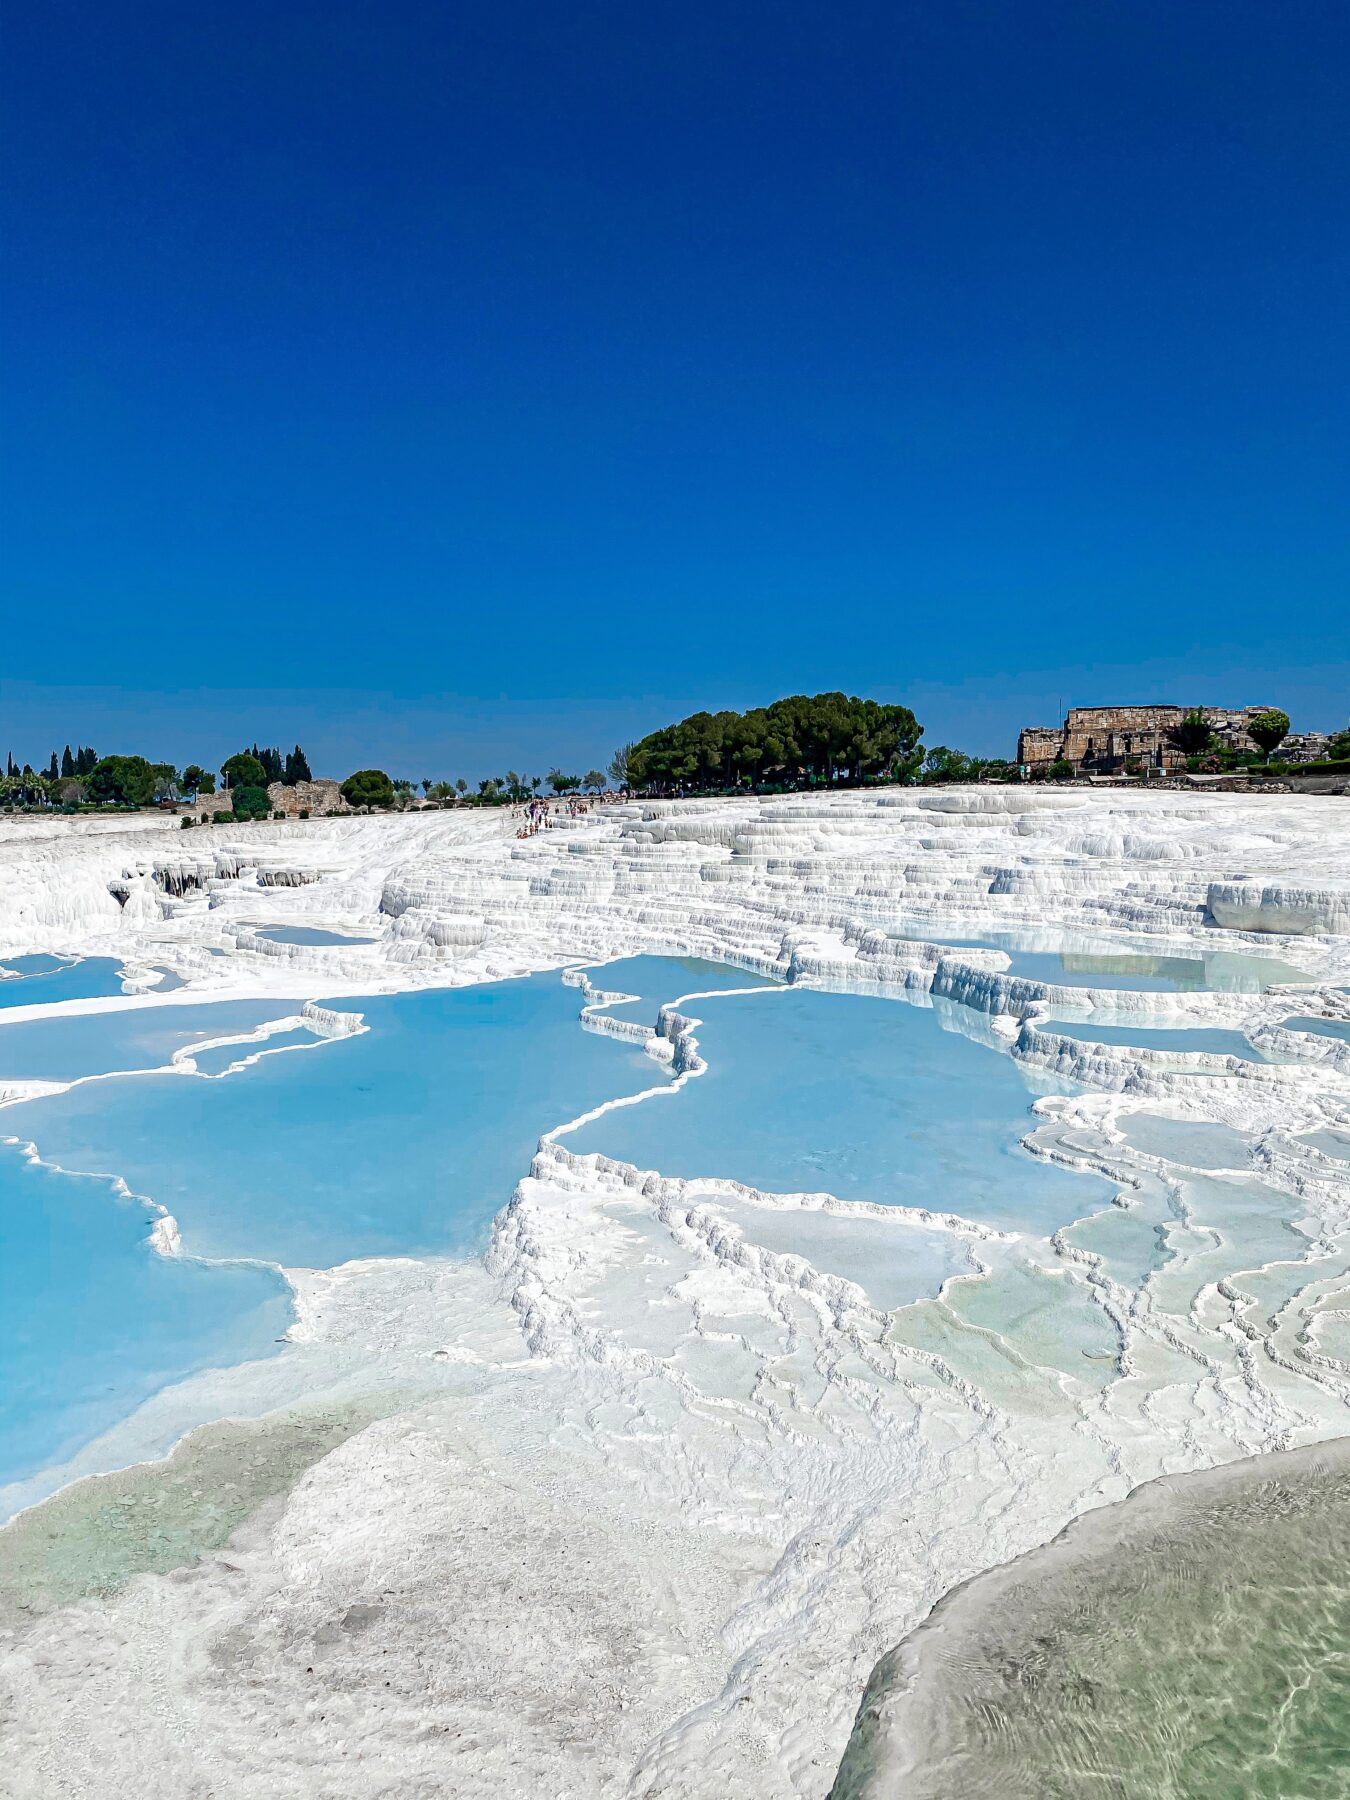 Pamukkale, witte rotsformaties helderblauw water